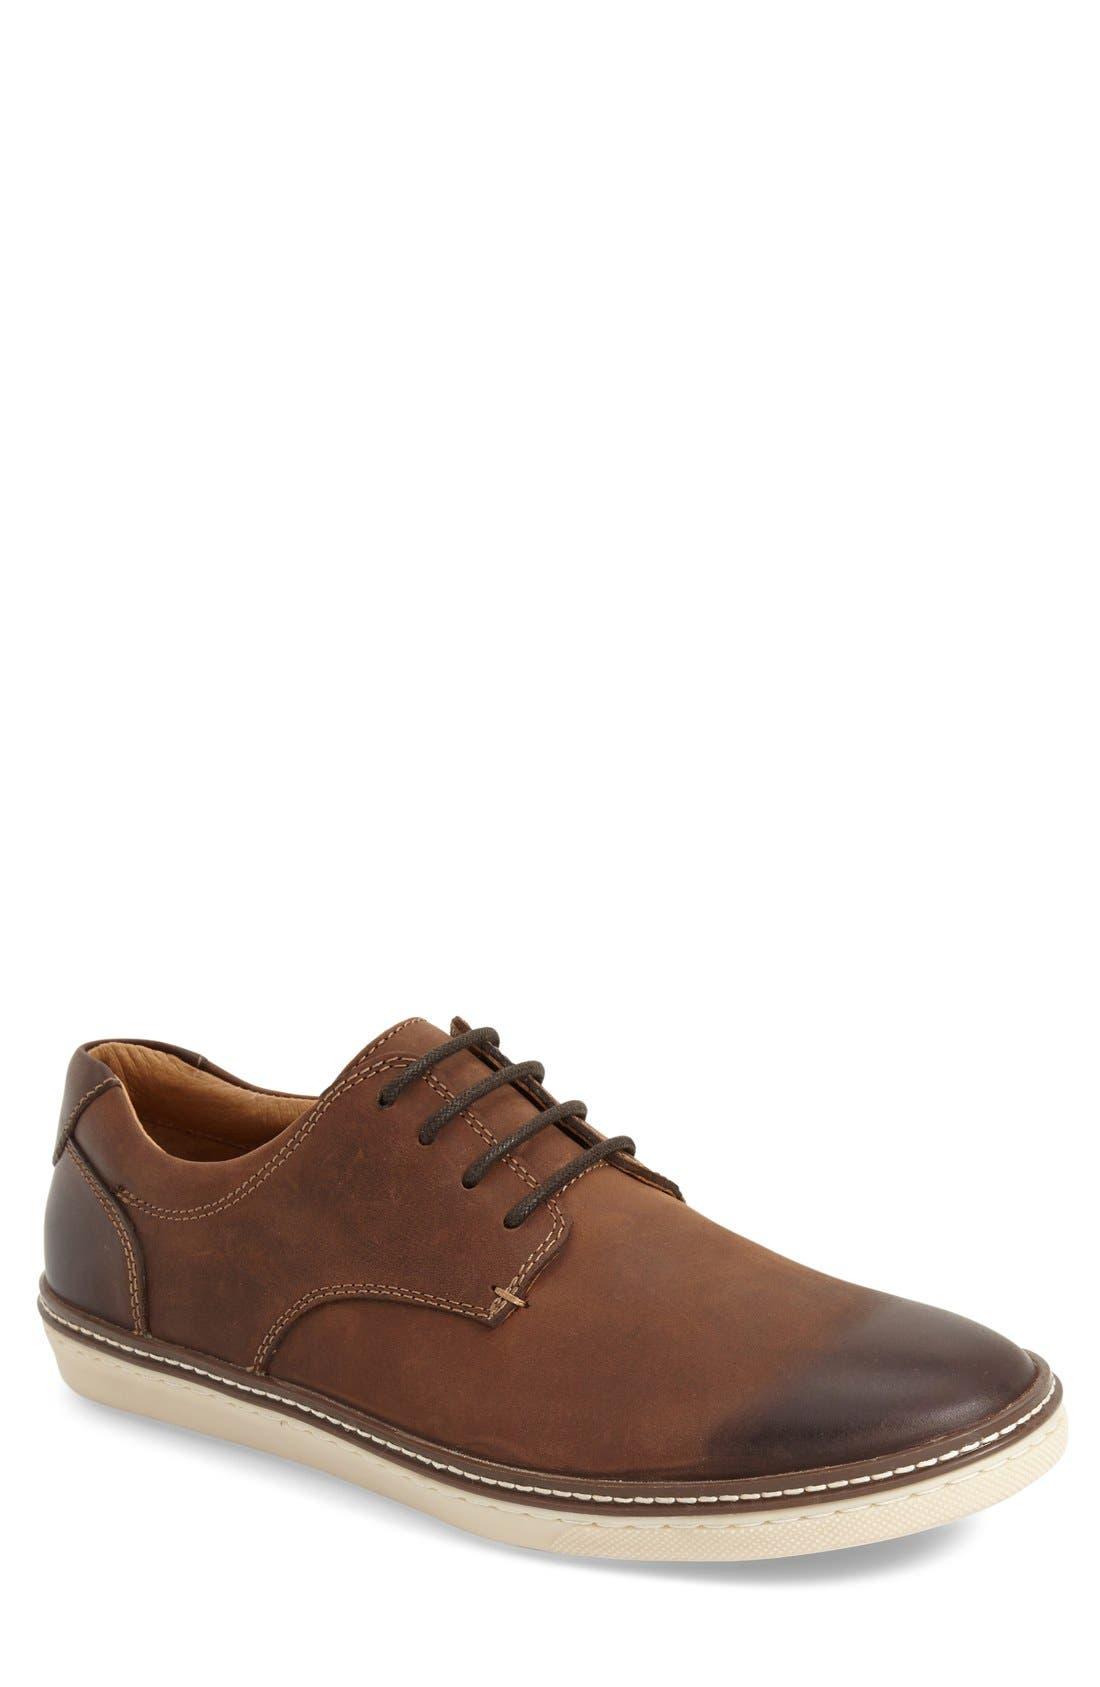 'McGuffey' Plain Toe Derby,                         Main,                         color, TAN CALFSKIN